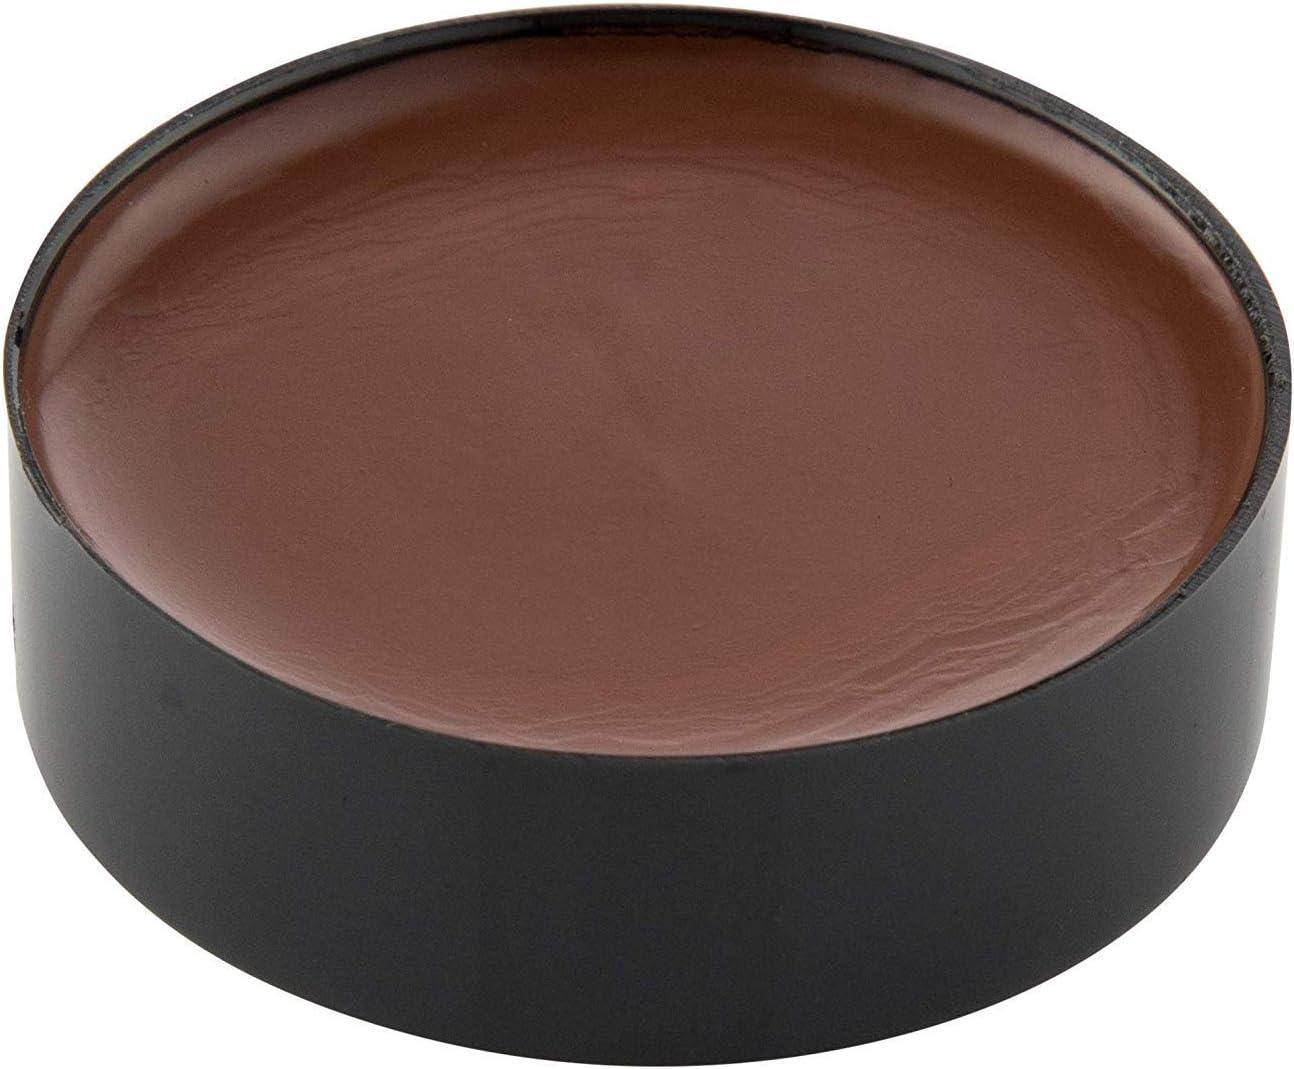 Mehron Makeup Color Cups (.5 oz) (Wolfman Brown)